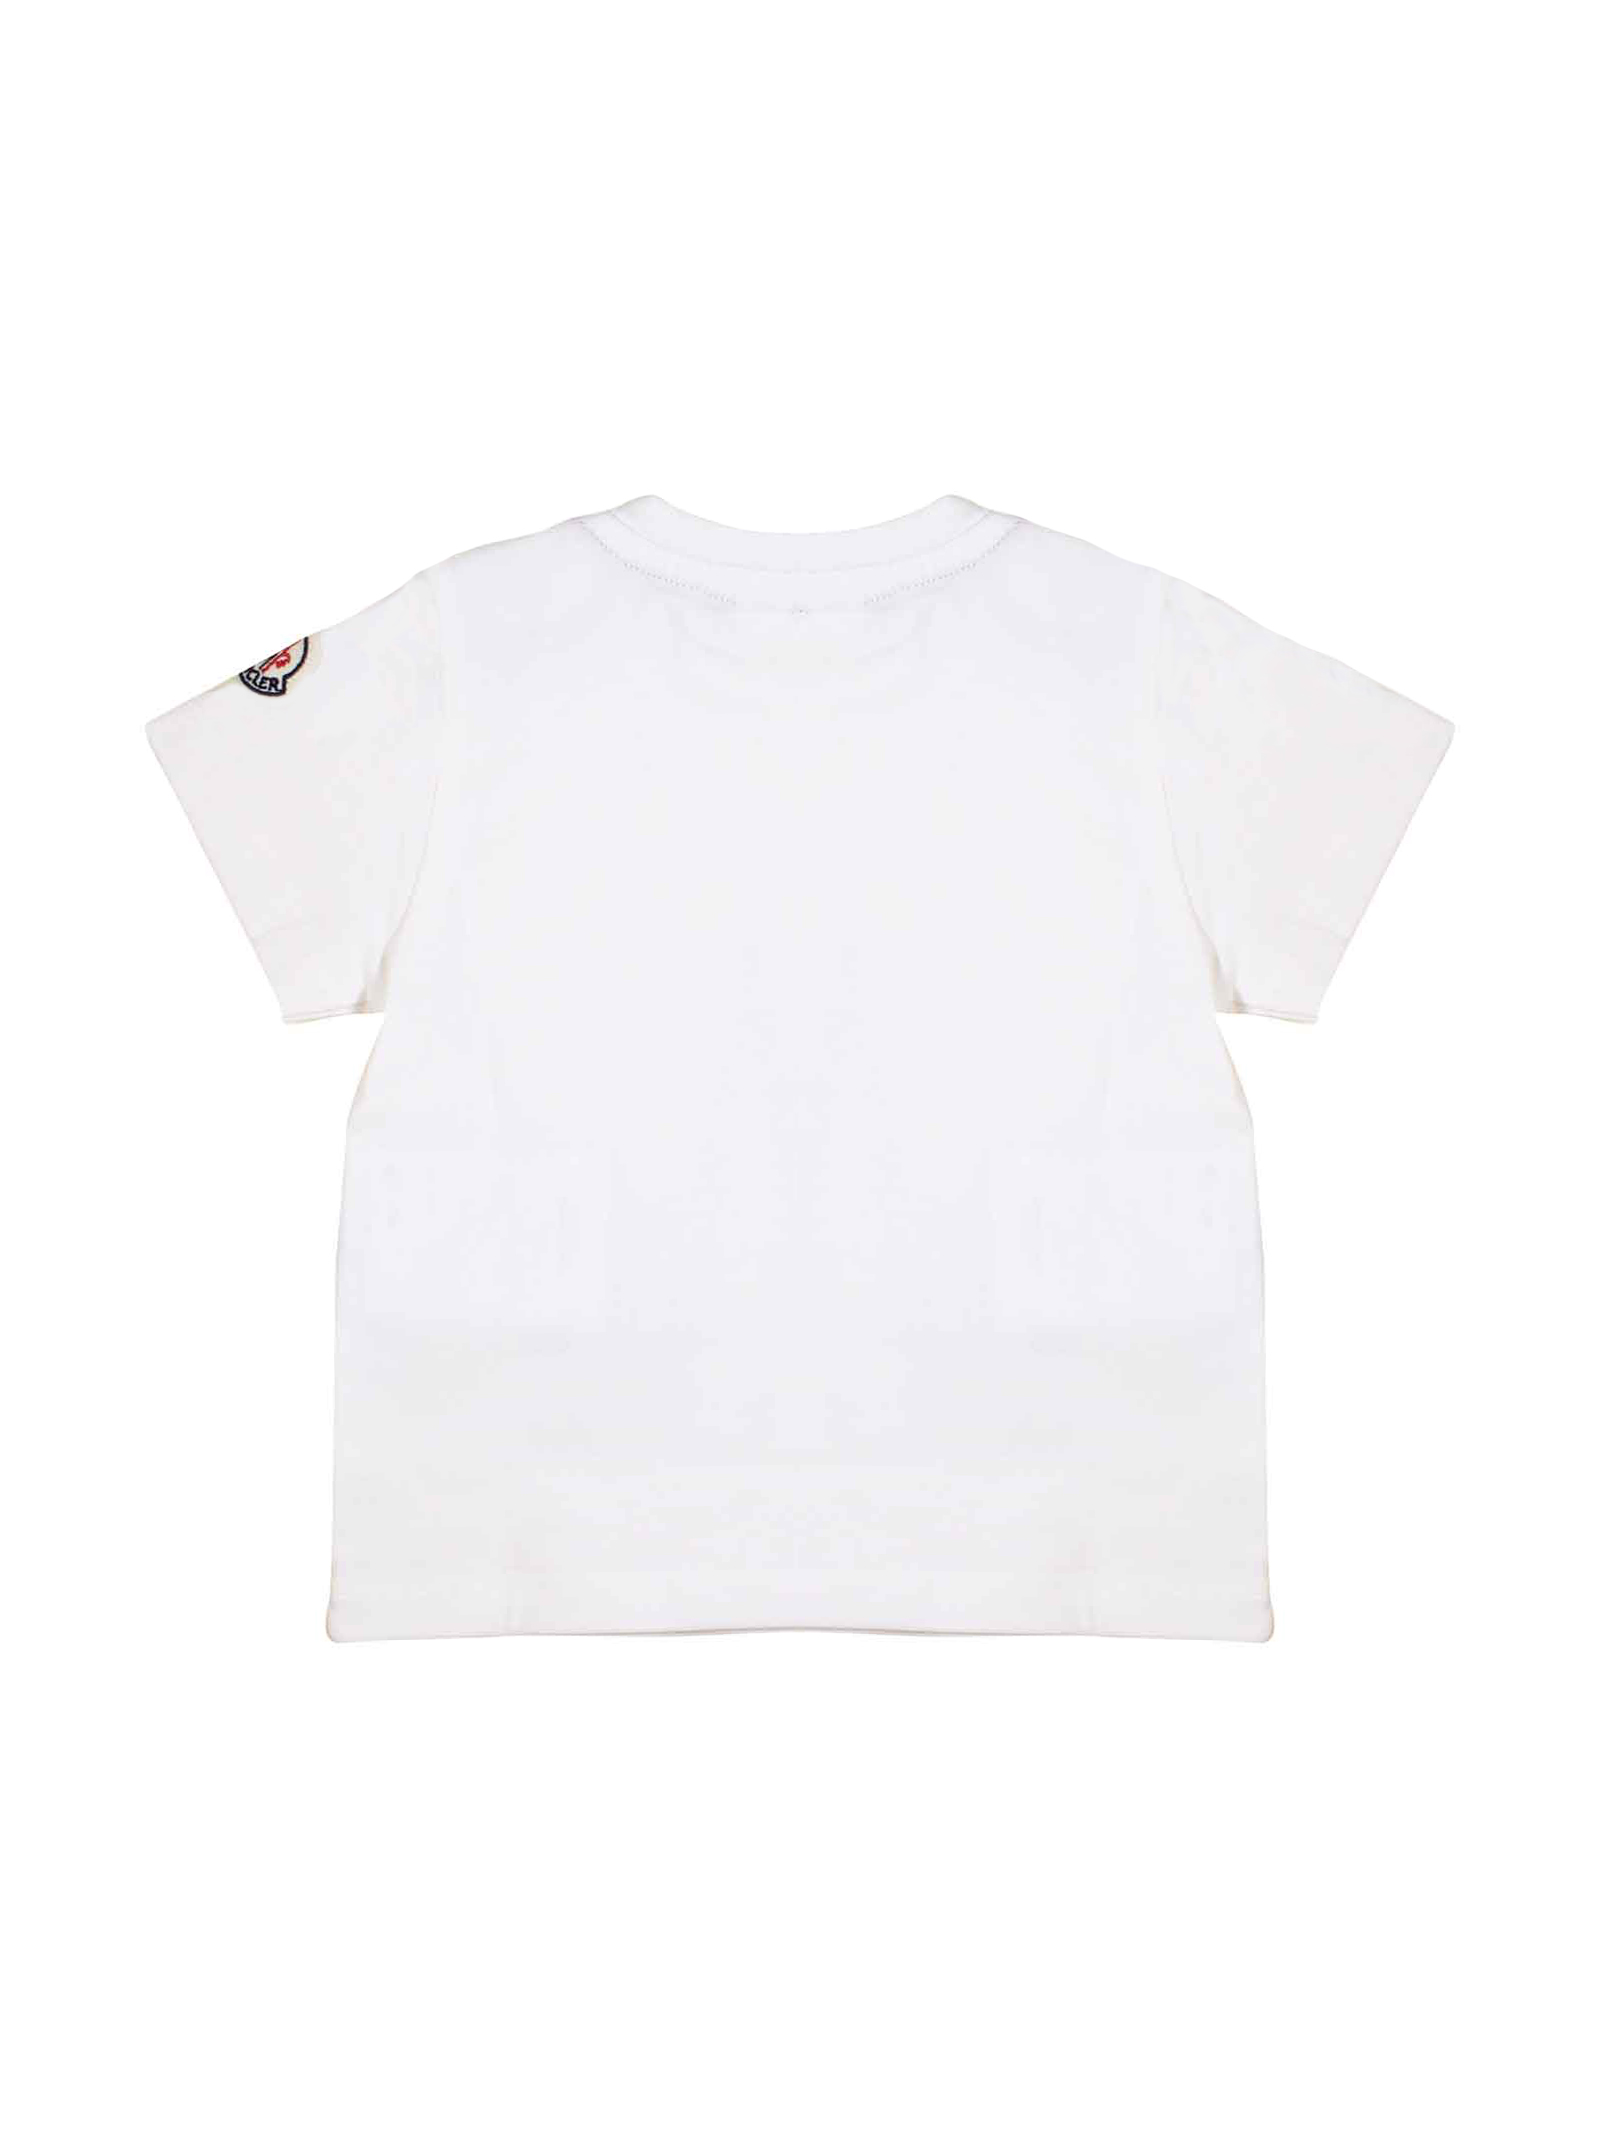 a8352537 MONCLER KIDS WHITE T-SHIRT FOR BOY Moncler Kids   8   8024750V8014034 ...